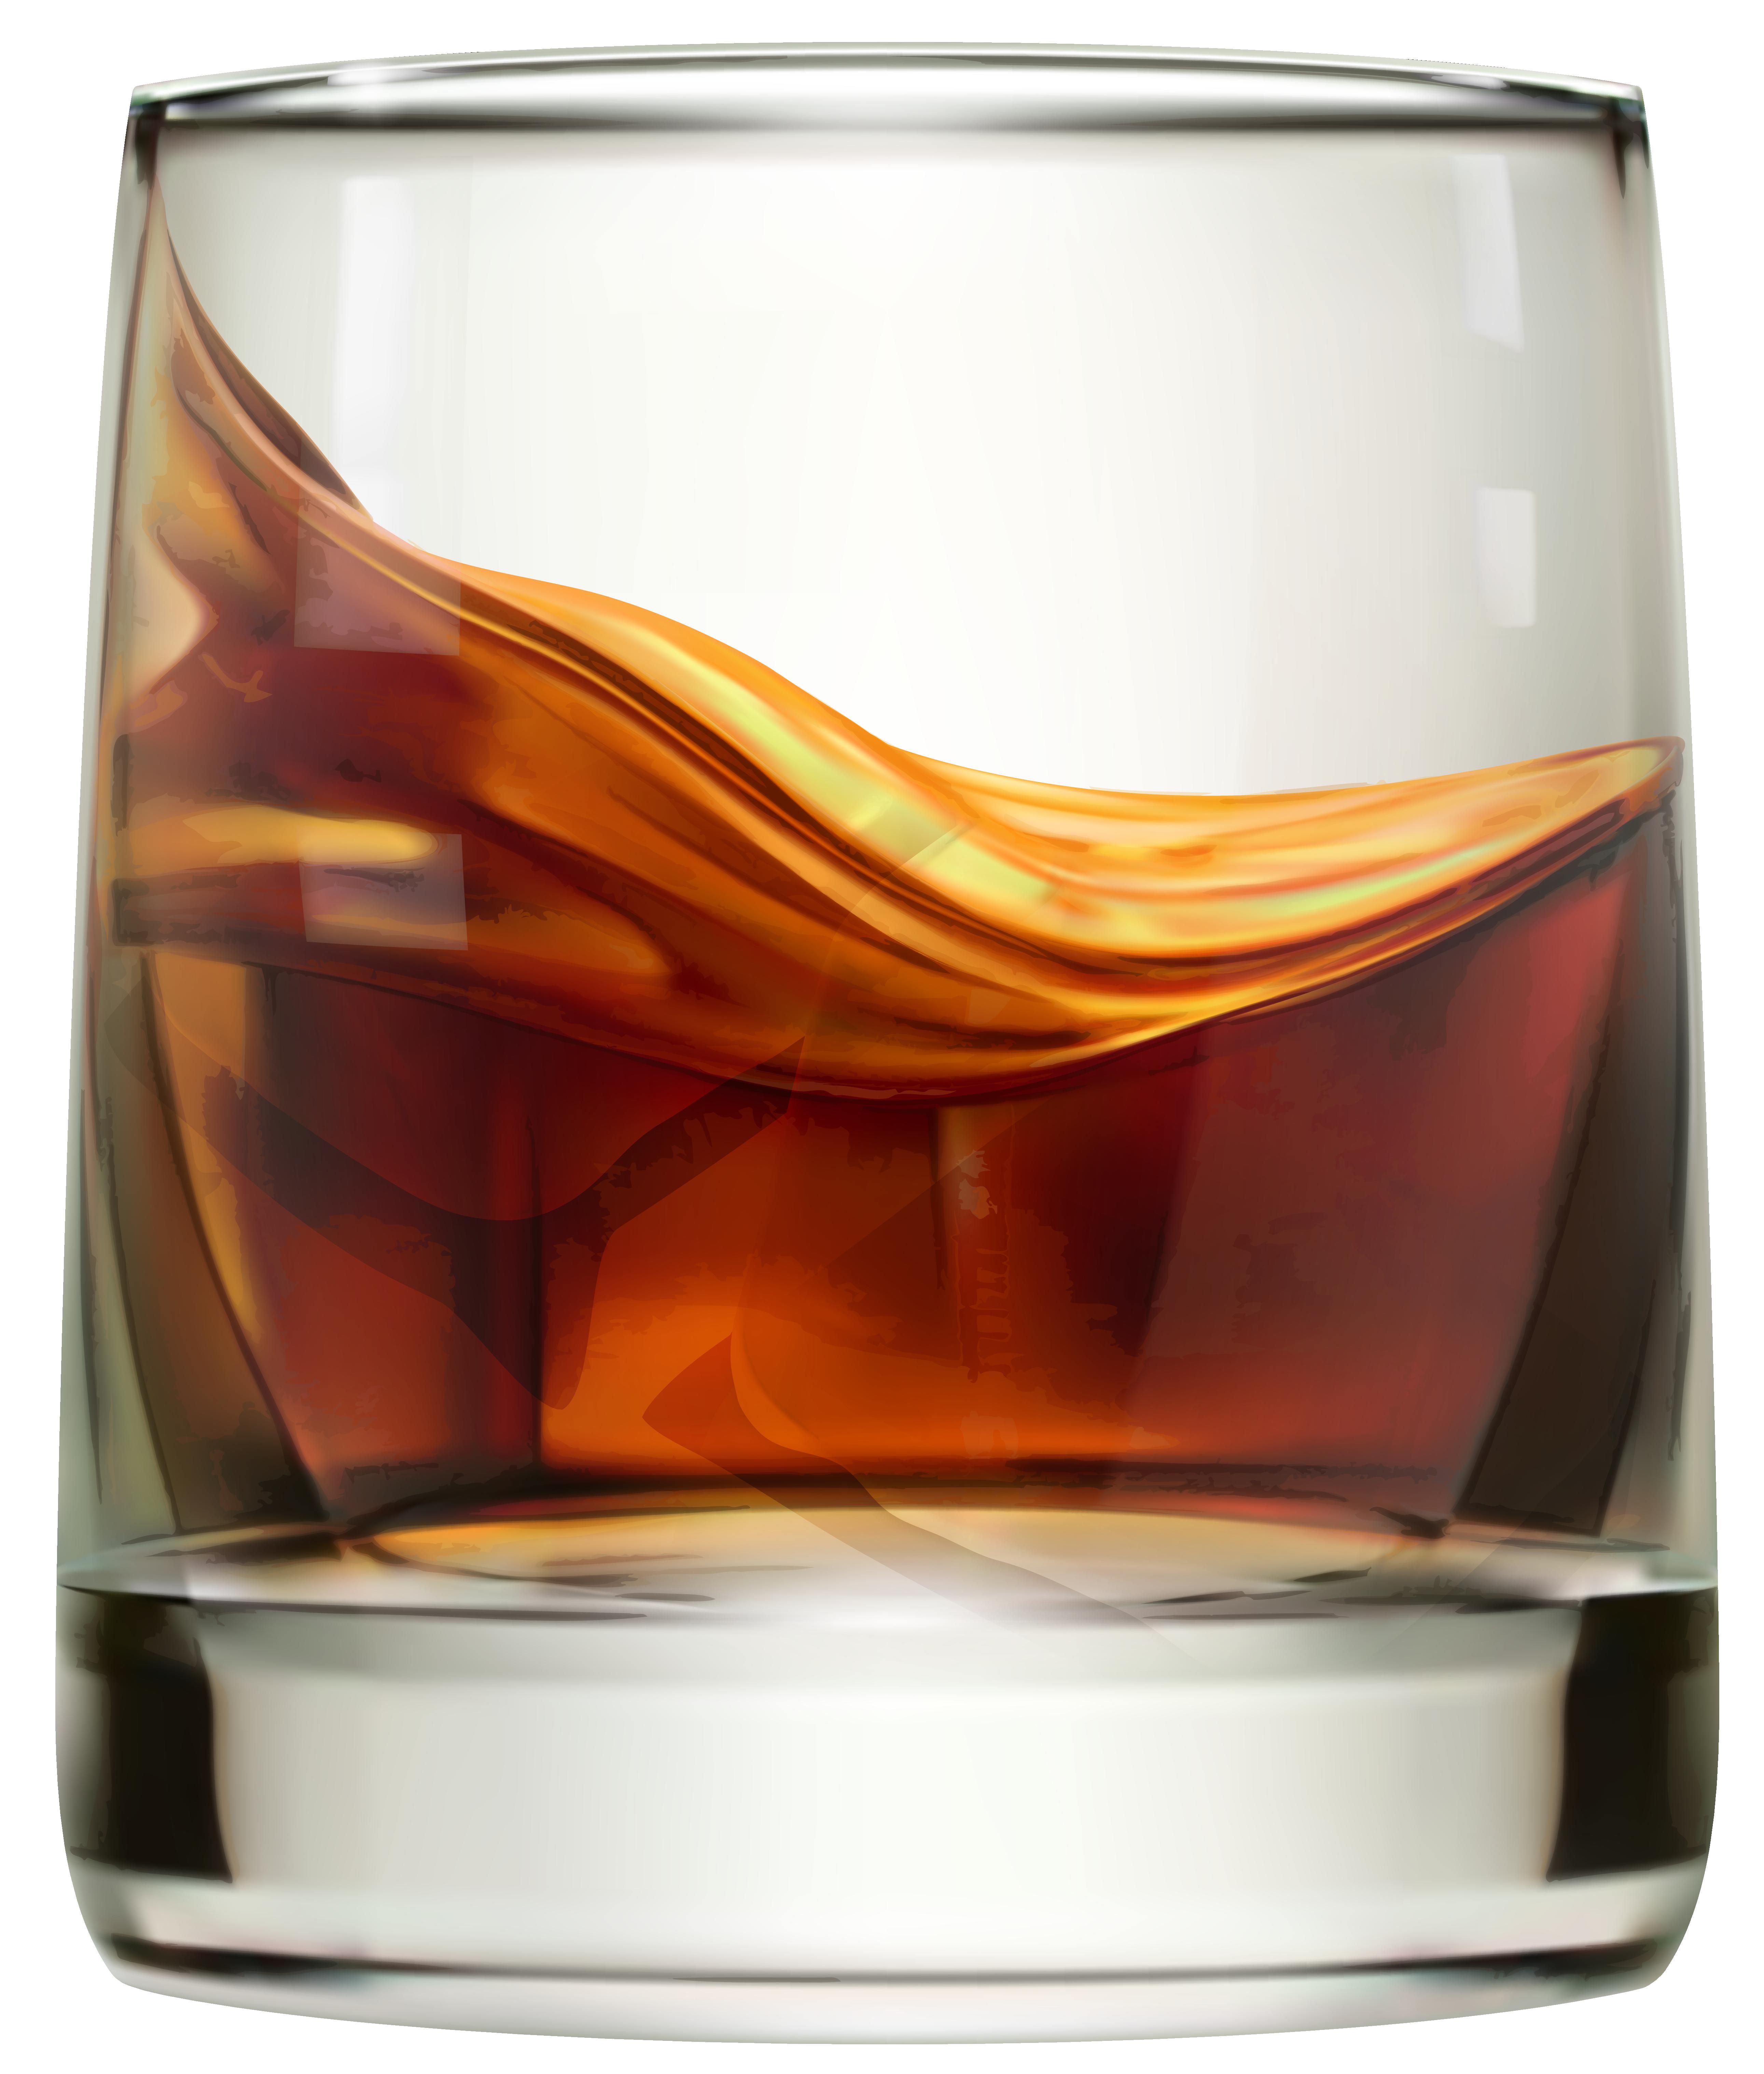 Cigar clipart bourbon glass. Whisky pinart drink stack